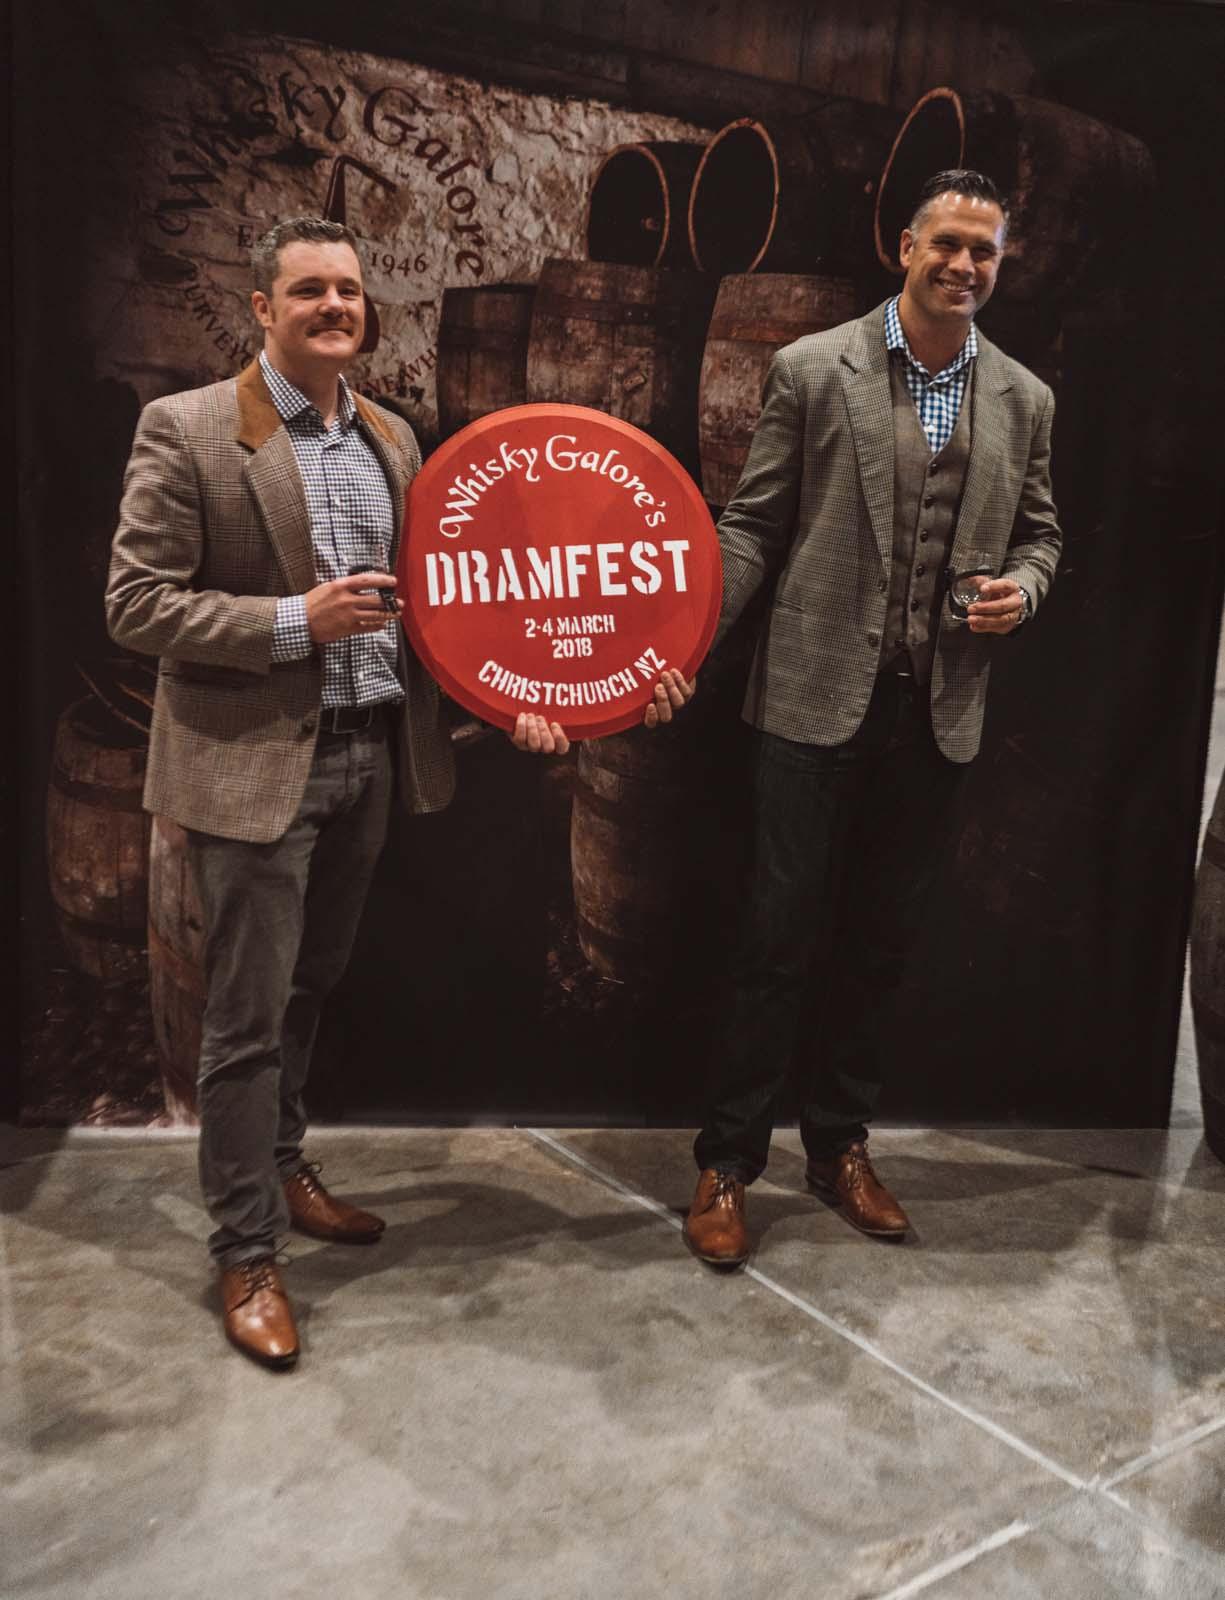 Dramfest 2018 for Whisky Galore-321.jpg